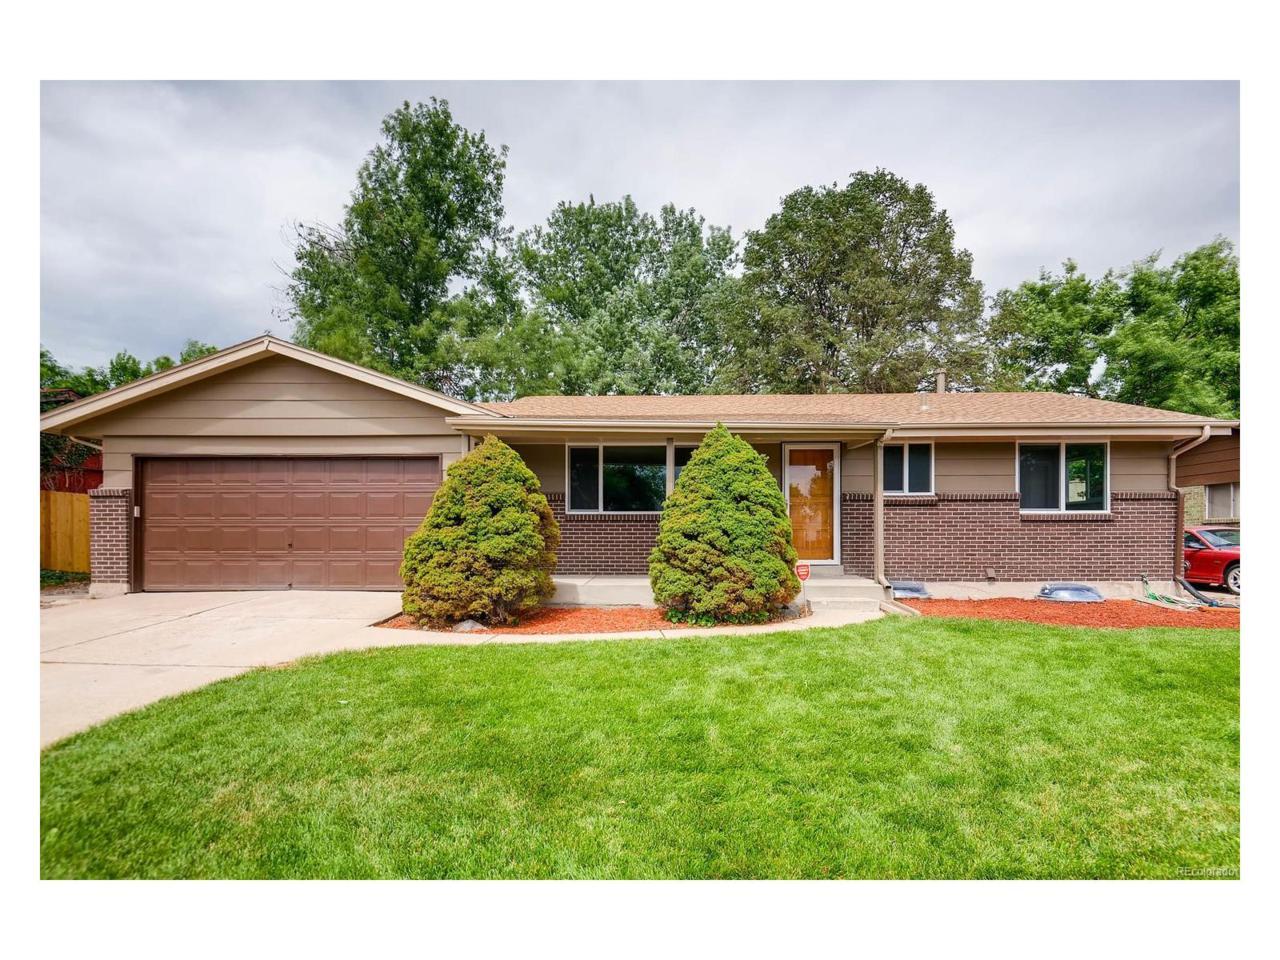 1255 S Hoyt Street, Lakewood, CO 80232 (MLS #6201352) :: 8z Real Estate